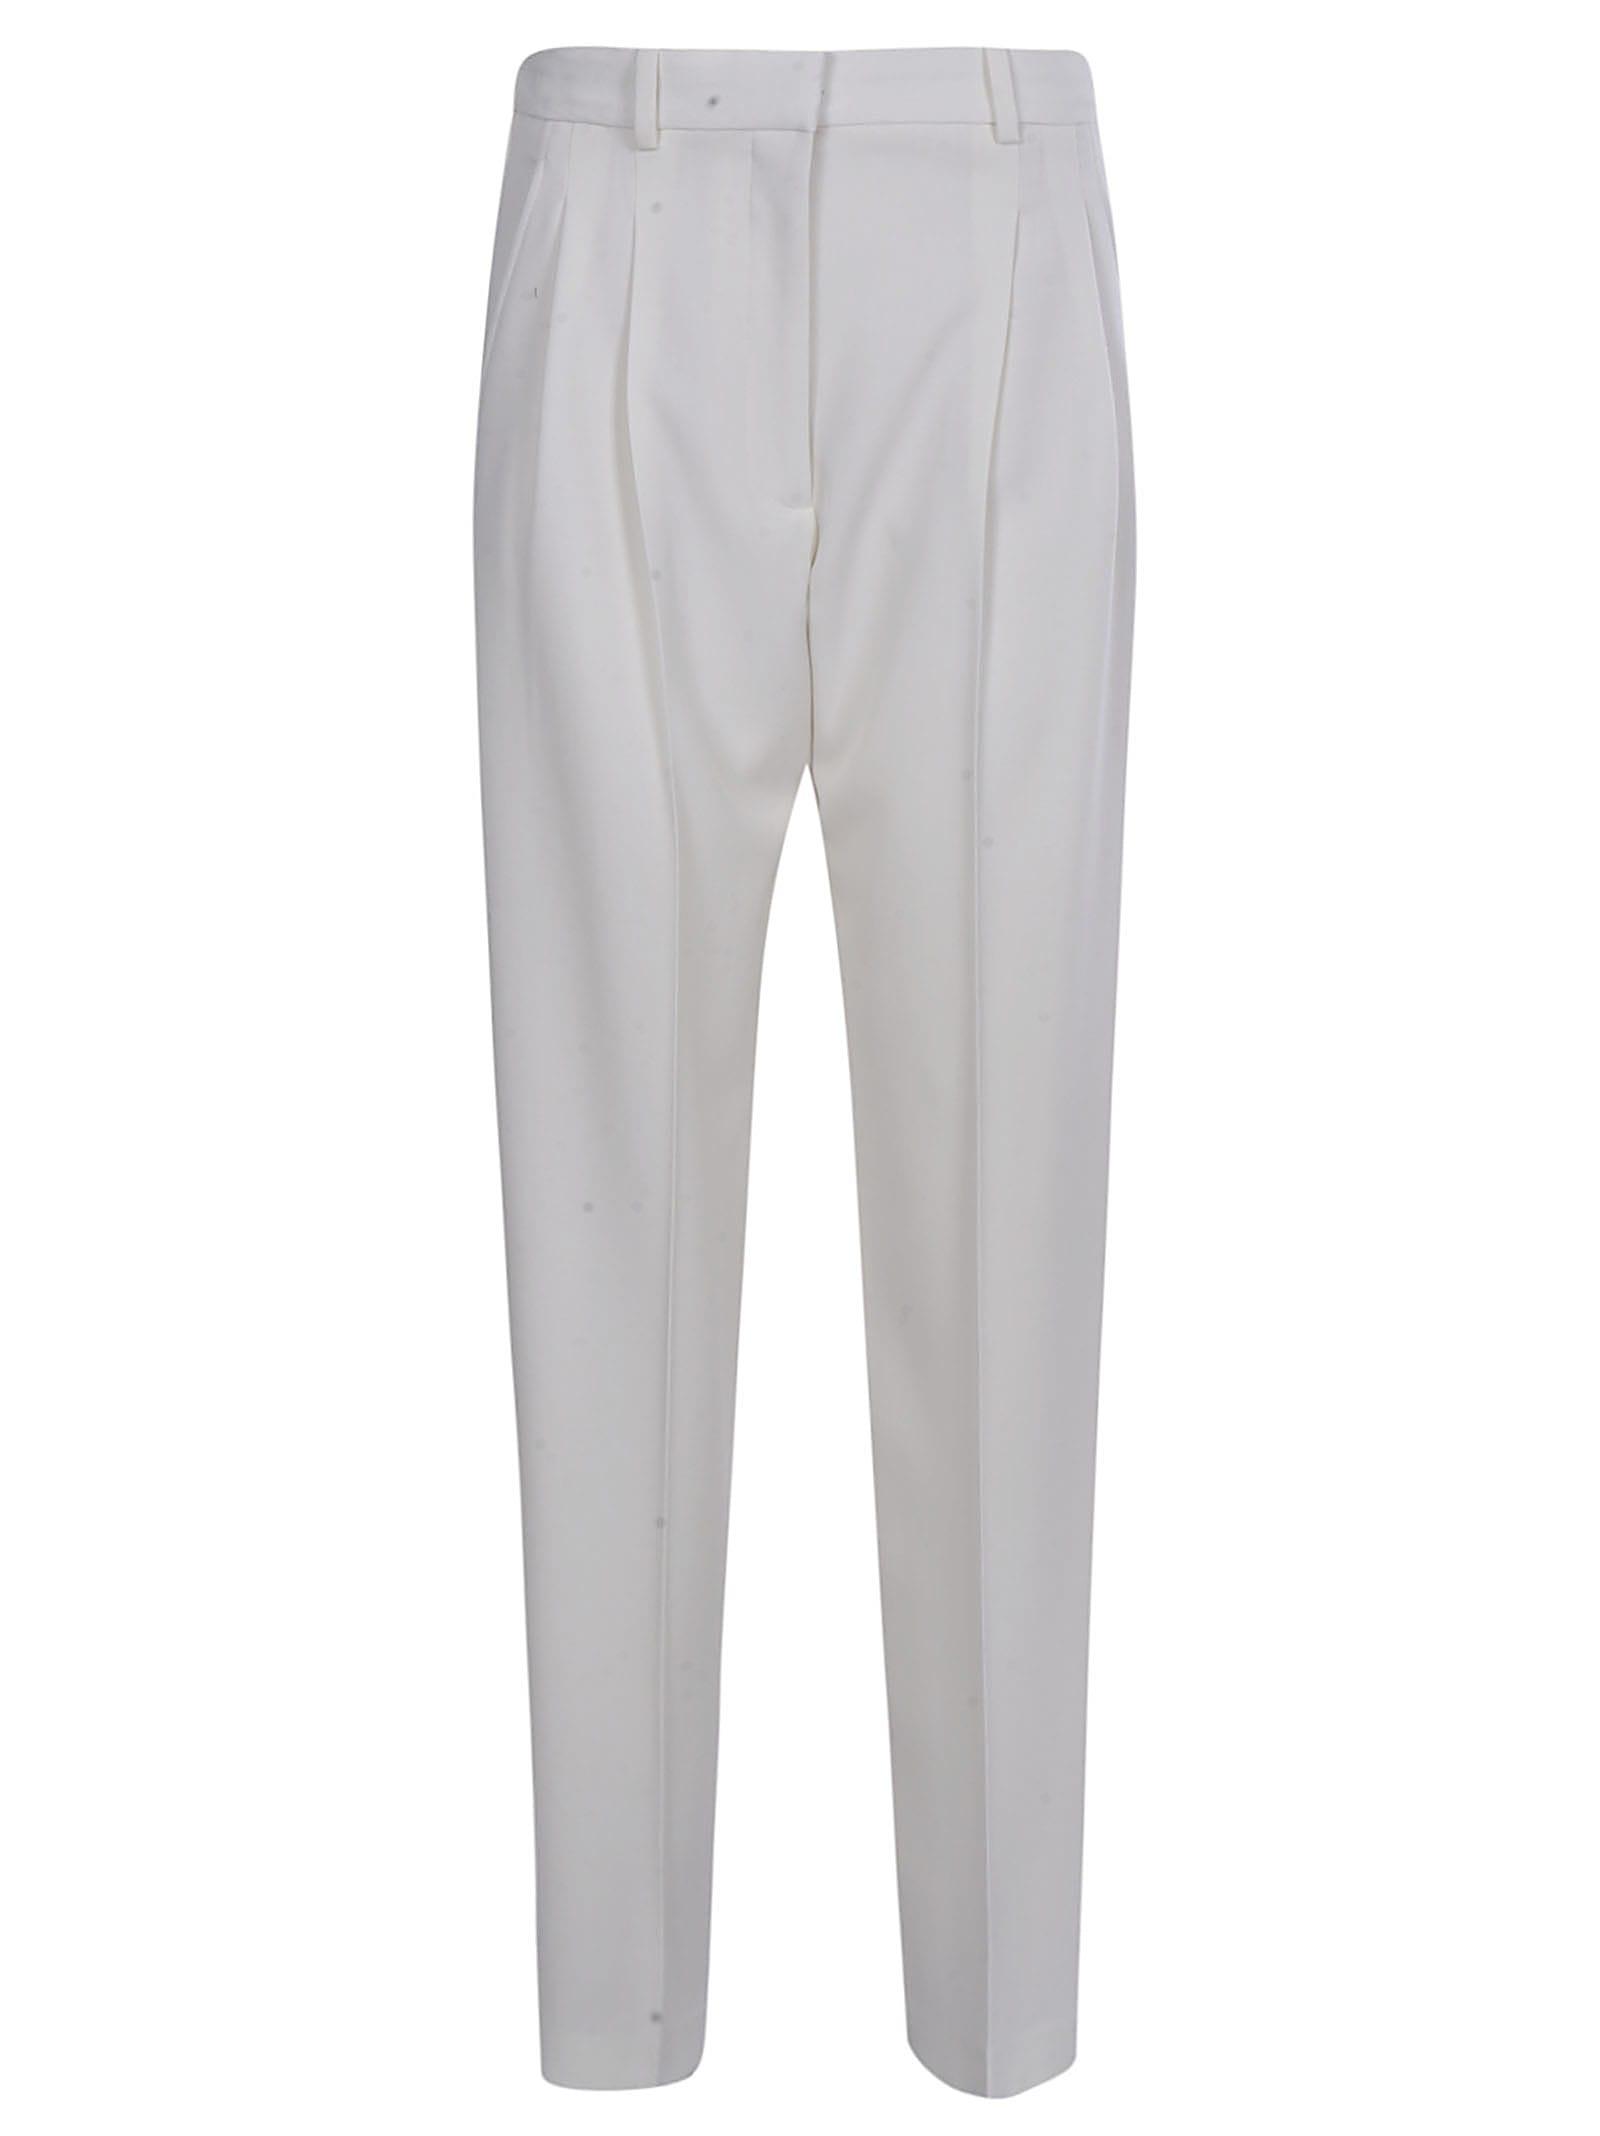 Stella McCartney Danya Trousers